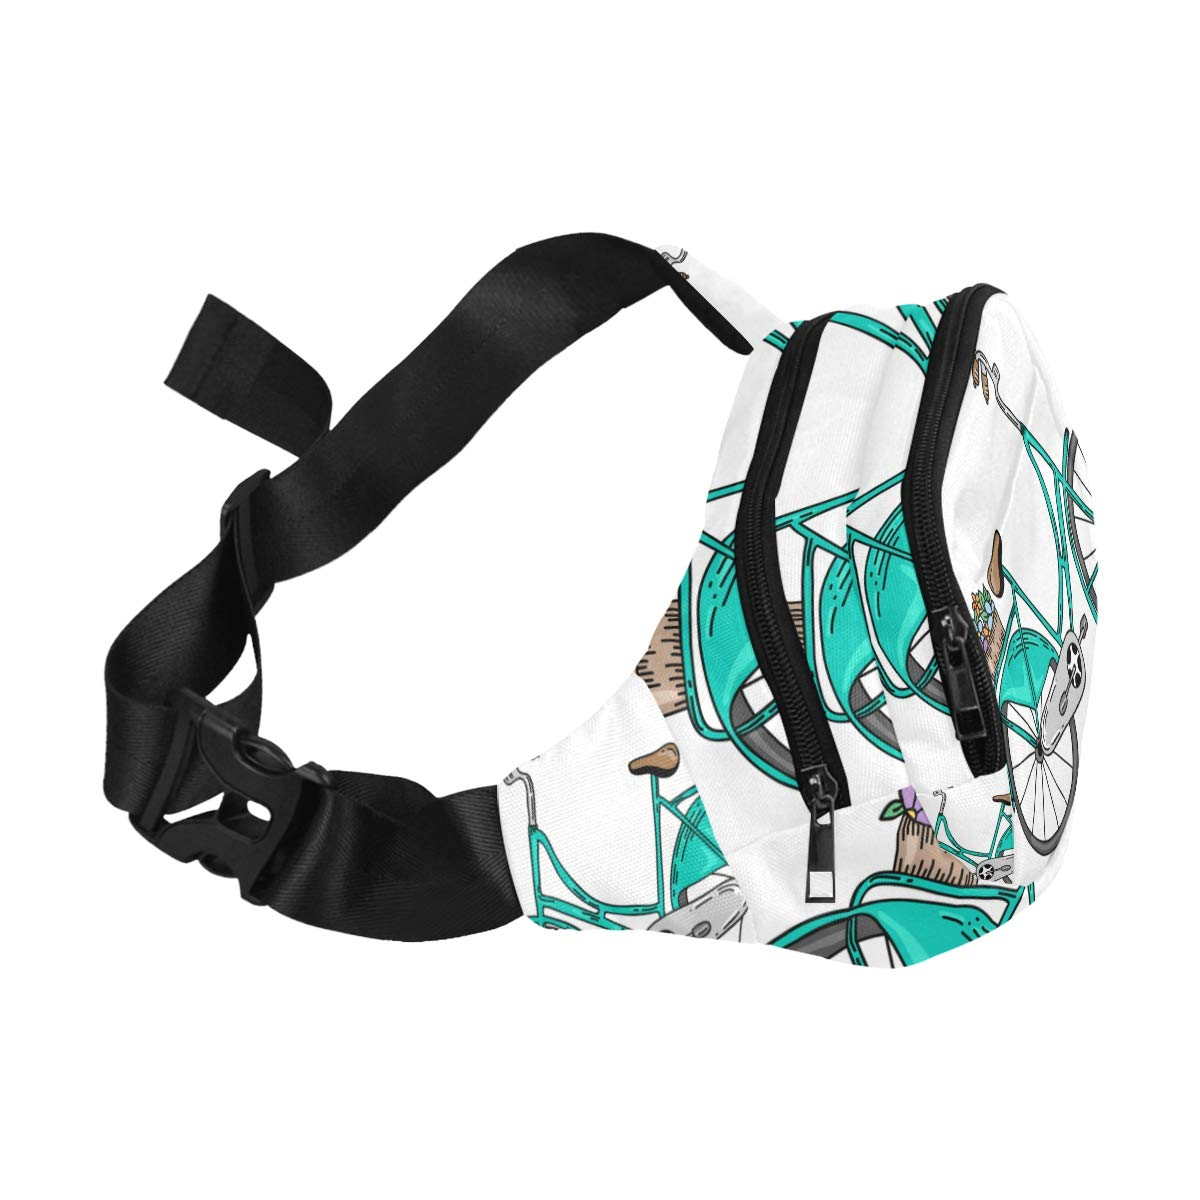 Hand-painted Bicycle Fenny Packs Waist Bags Adjustable Belt Waterproof Nylon Travel Running Sport Vacation Party For Men Women Boys Girls Kids